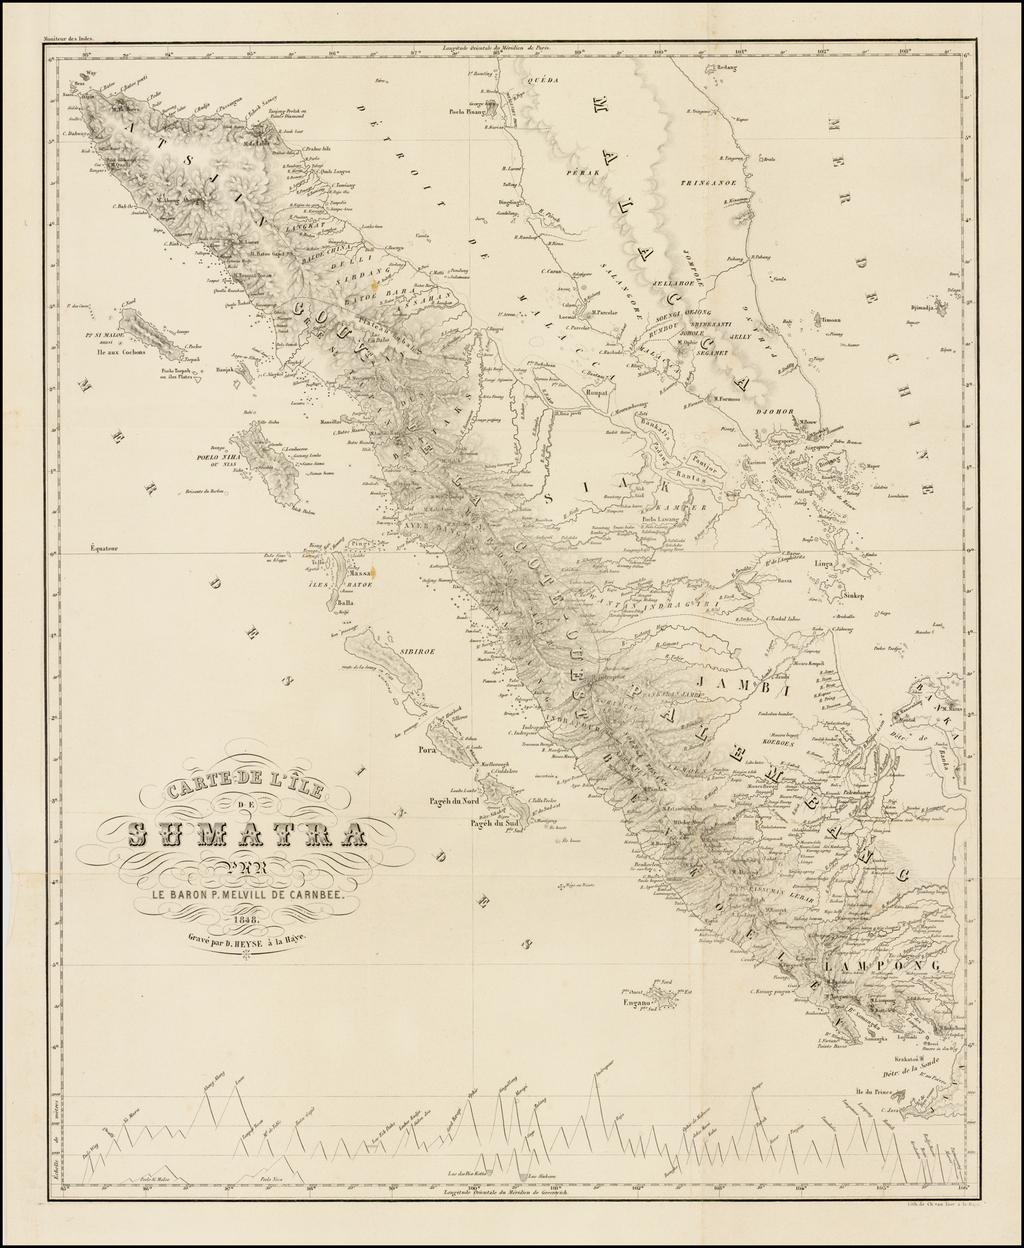 Carte De L'Ile De Sumatra Par Le Baron P Melvill De Carnbee.  1848  (includes Singapore and Straits of Malacca) By Pieter Baron Melvill van Carnbee